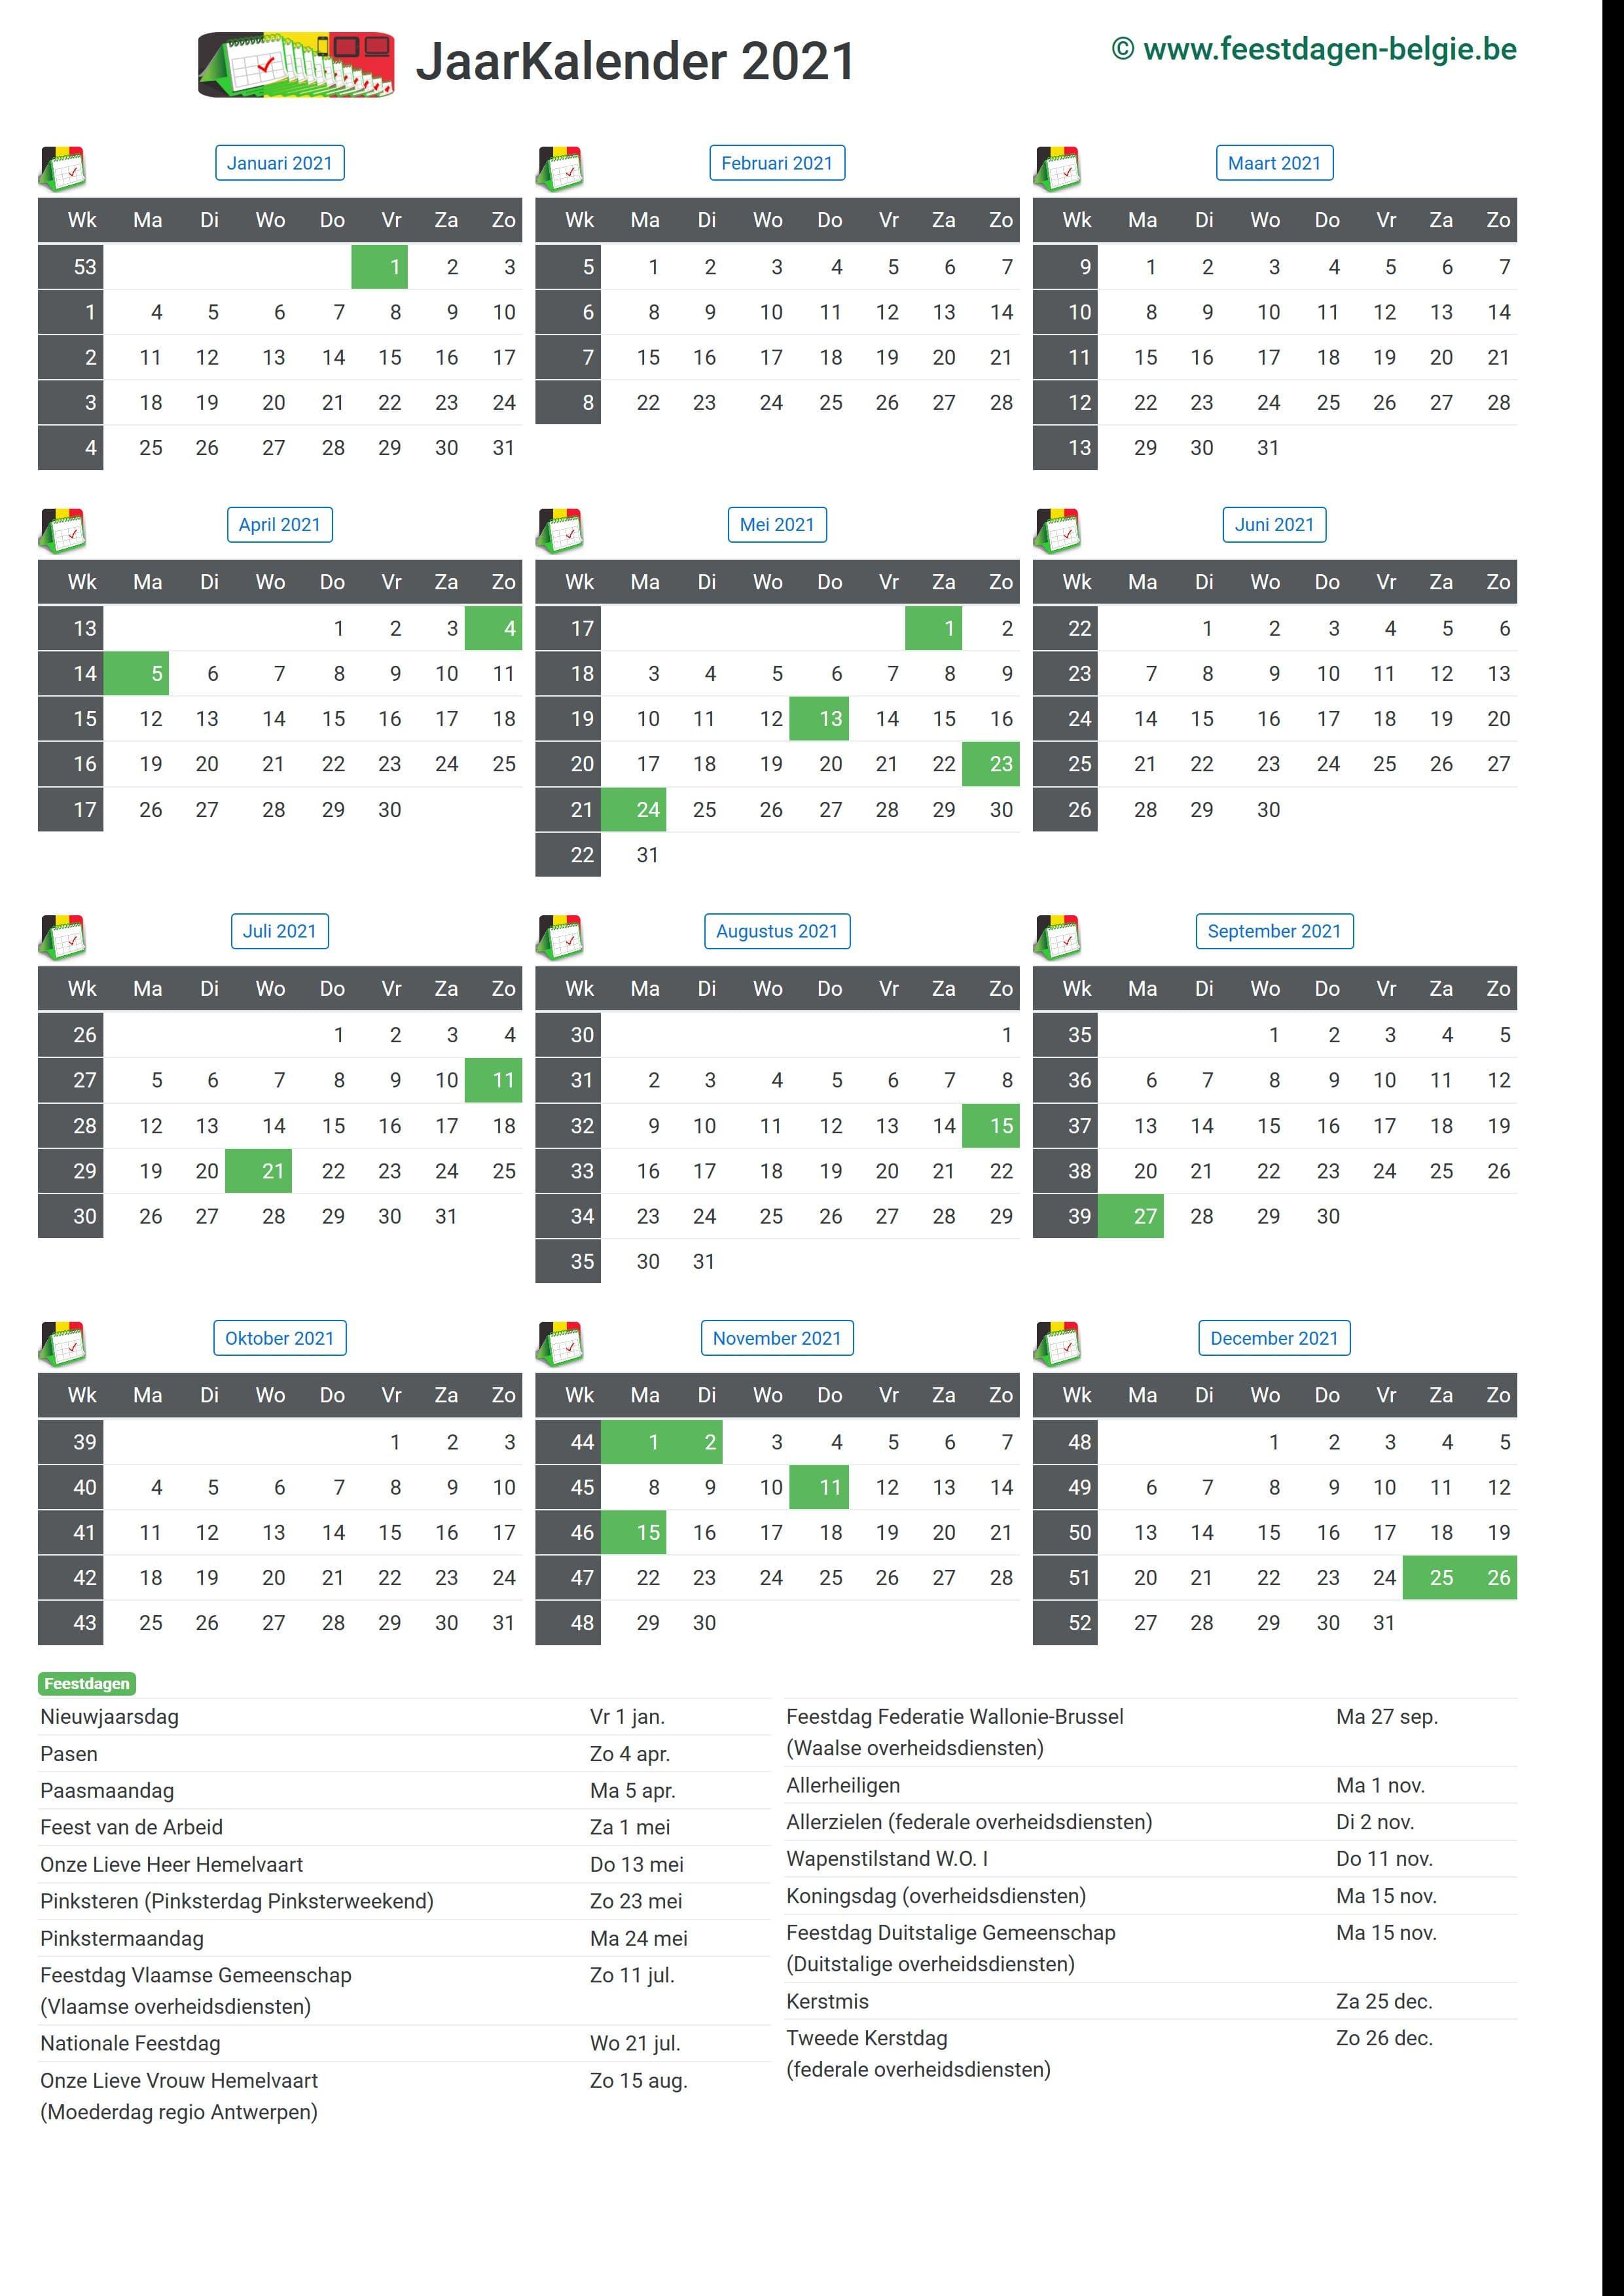 Maandkalender 2021 Maart Belgie Verlengde Weekends Feestdagen Schoolvakanties